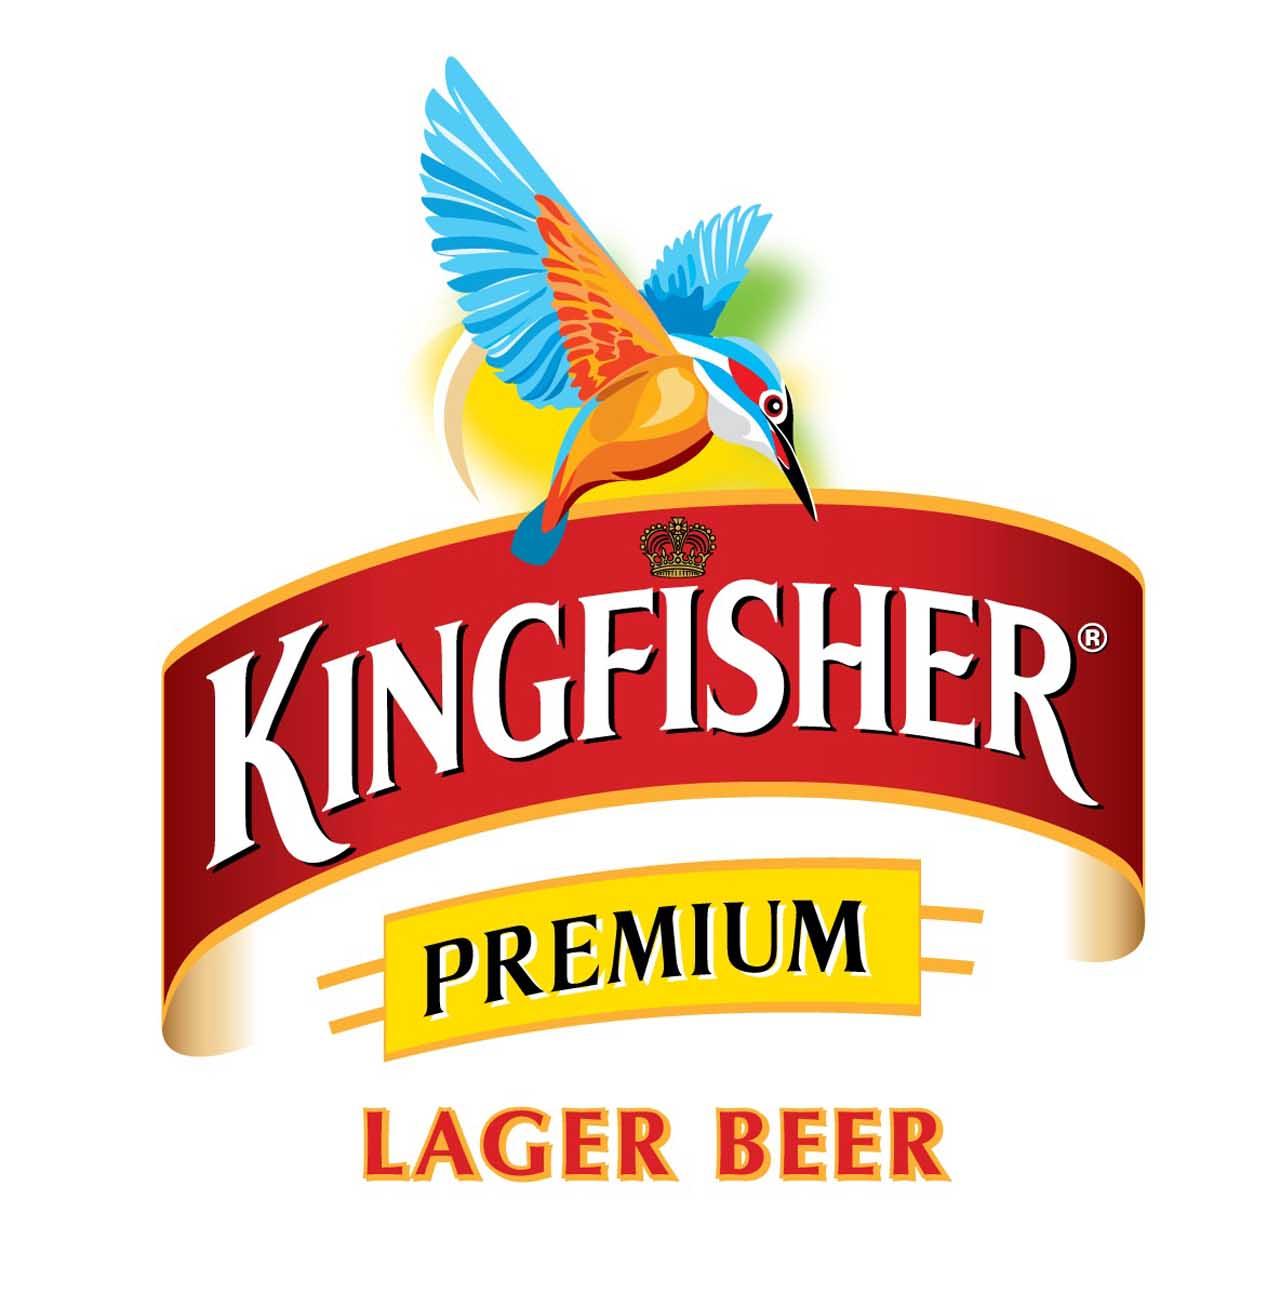 Kingfisher Logo Hd Wallpaper Clipart Best